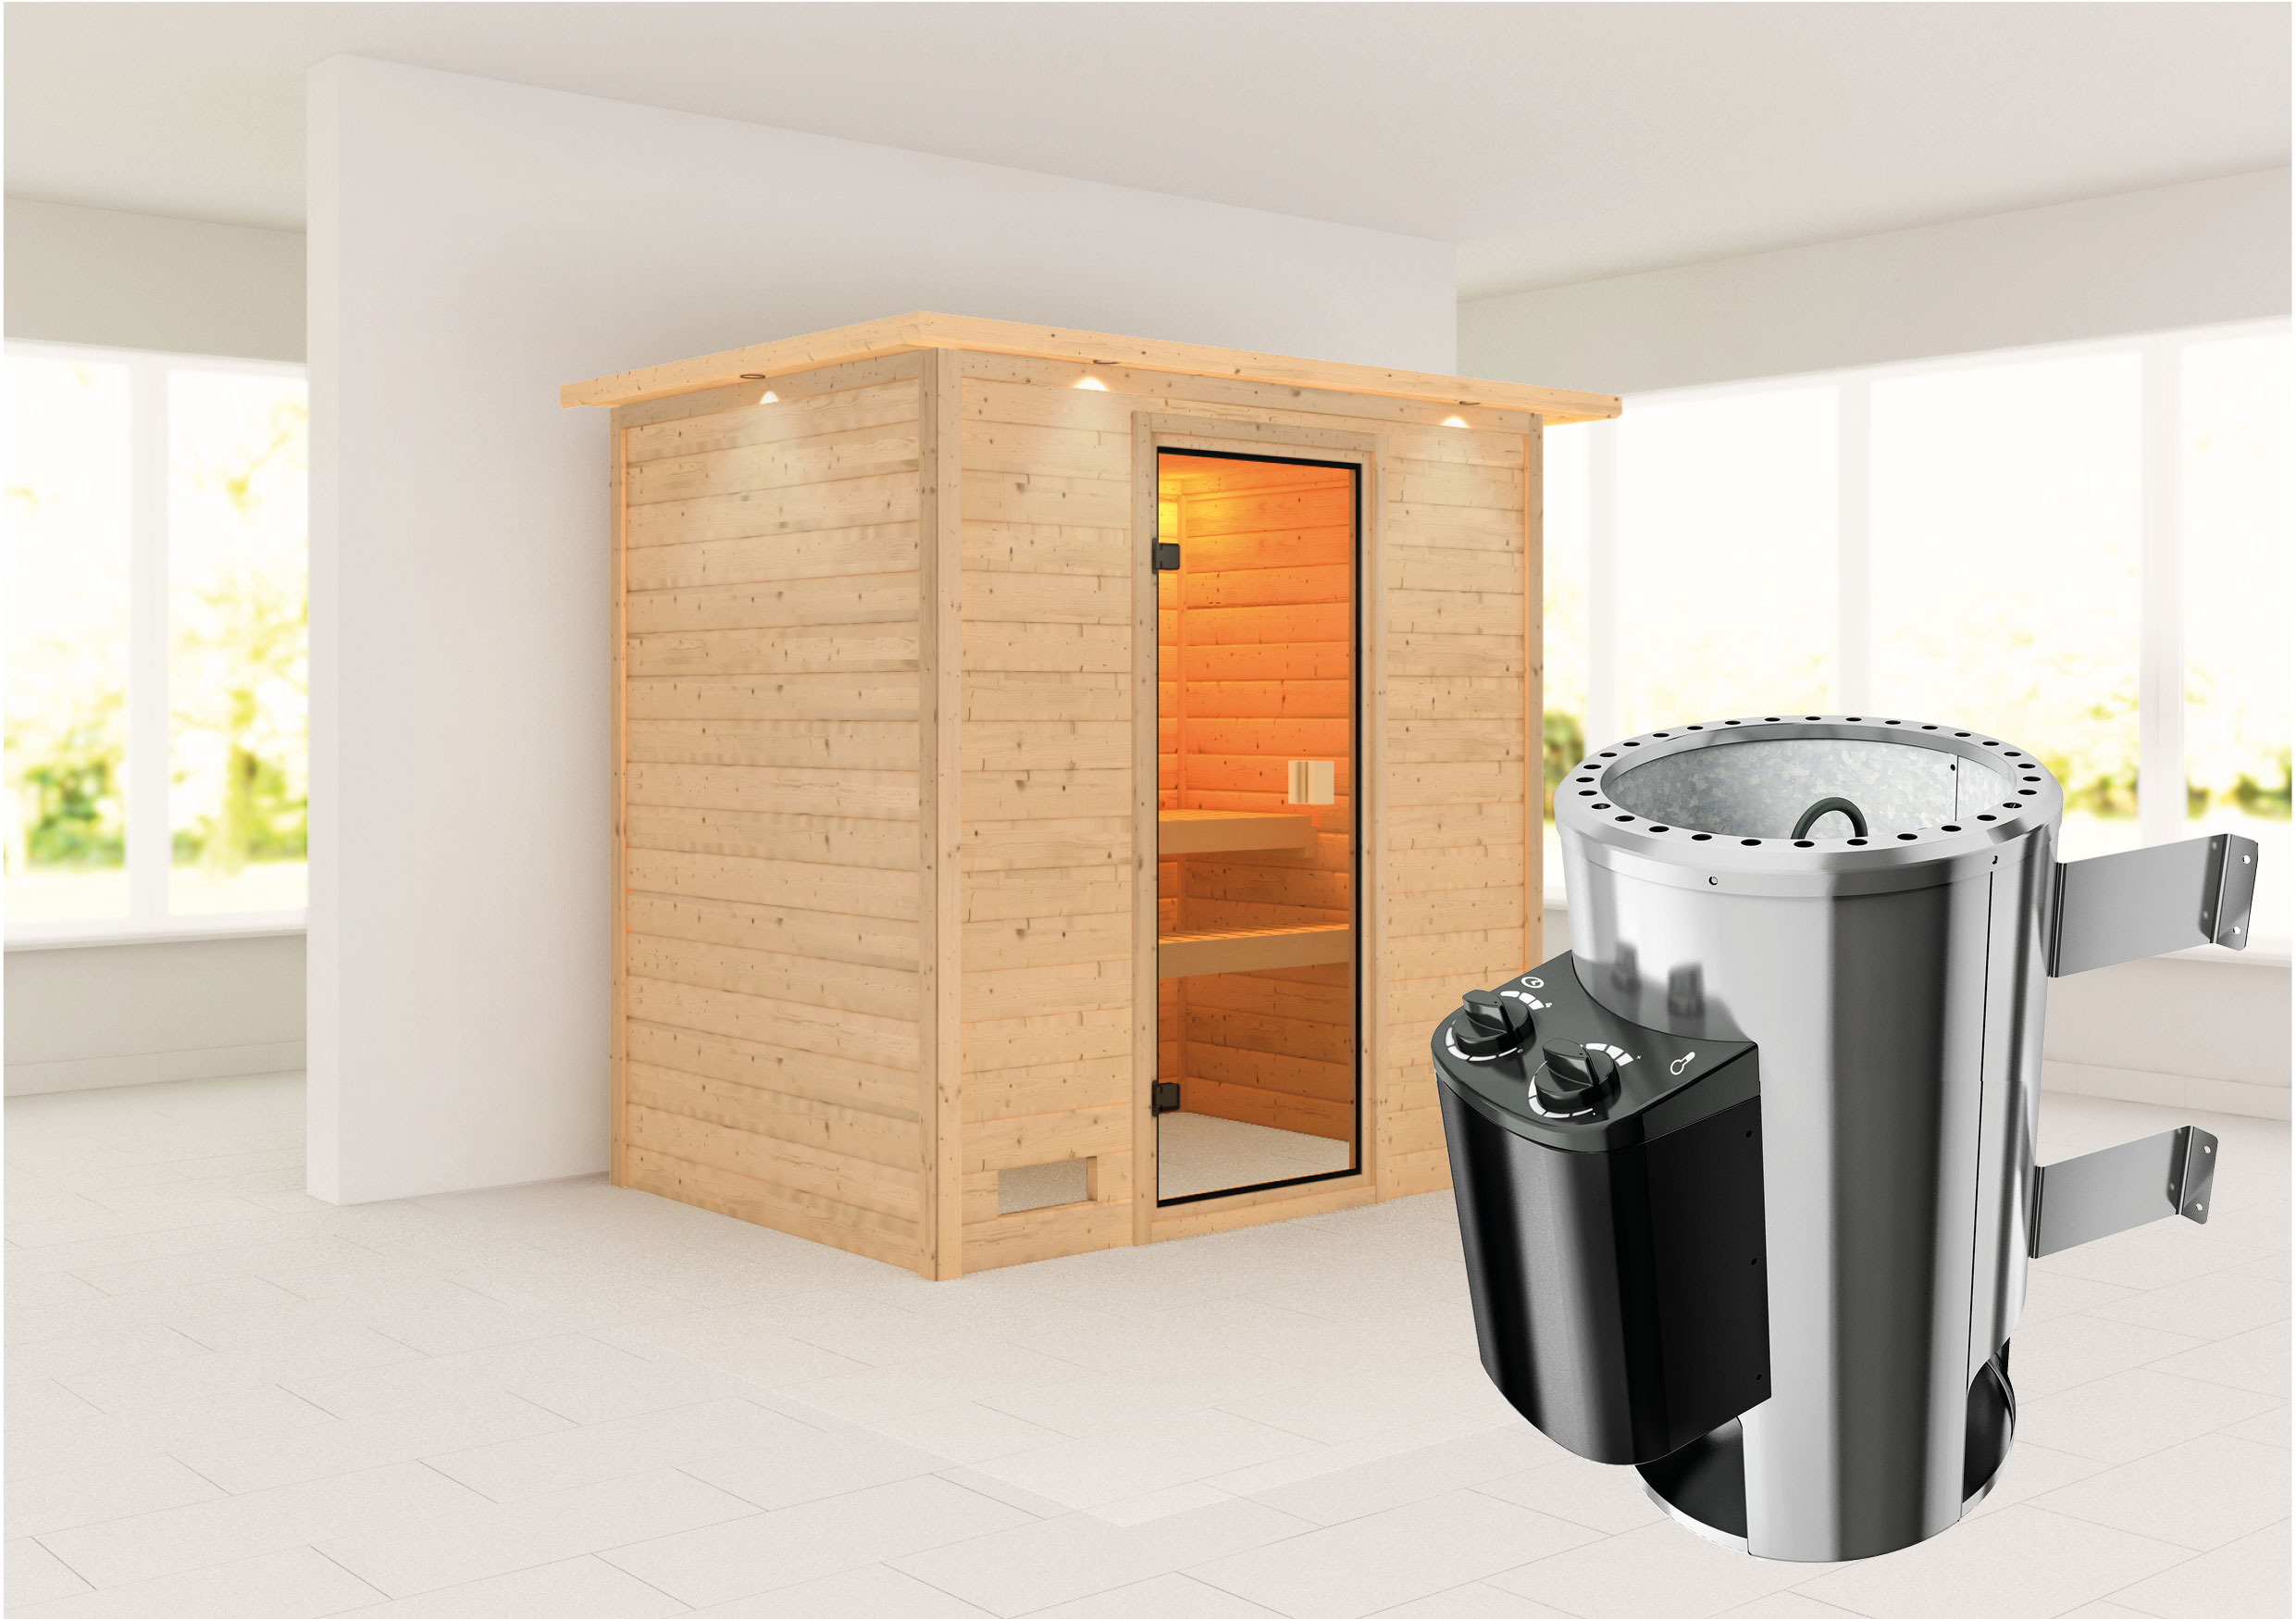 karibu sauna ronja 38mm 230v dachkranz ofen 3 6kw intern classic t r bei. Black Bedroom Furniture Sets. Home Design Ideas